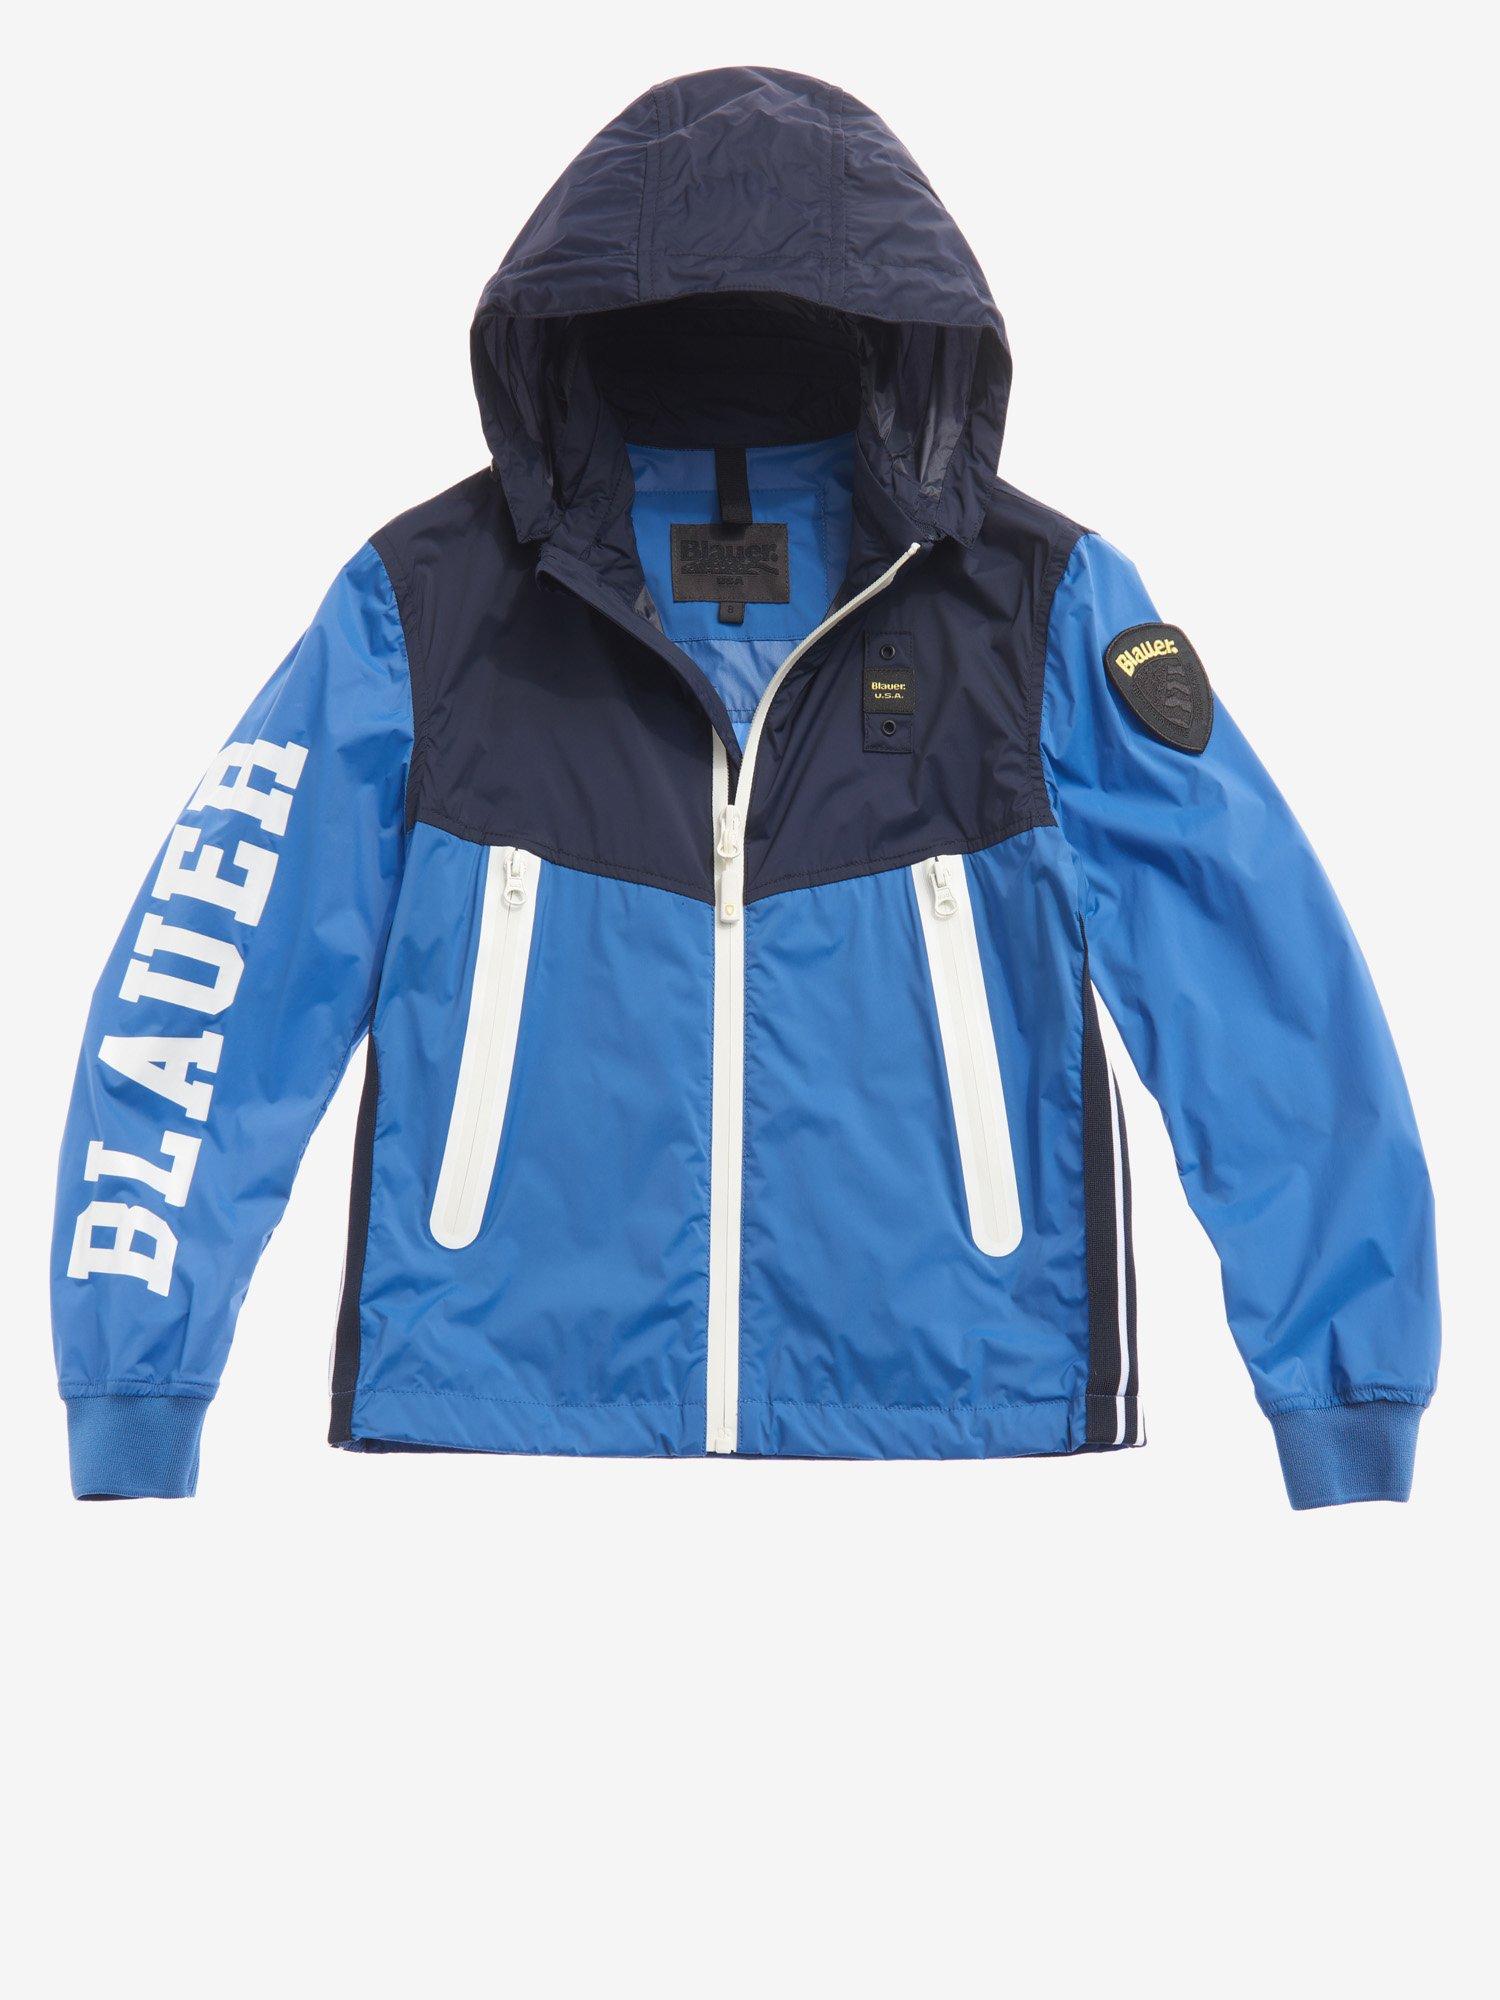 Blauer - CAZADORA NIÑO SIN FORRO BICOLOR GORDON - Light Sapphire Blue - Blauer